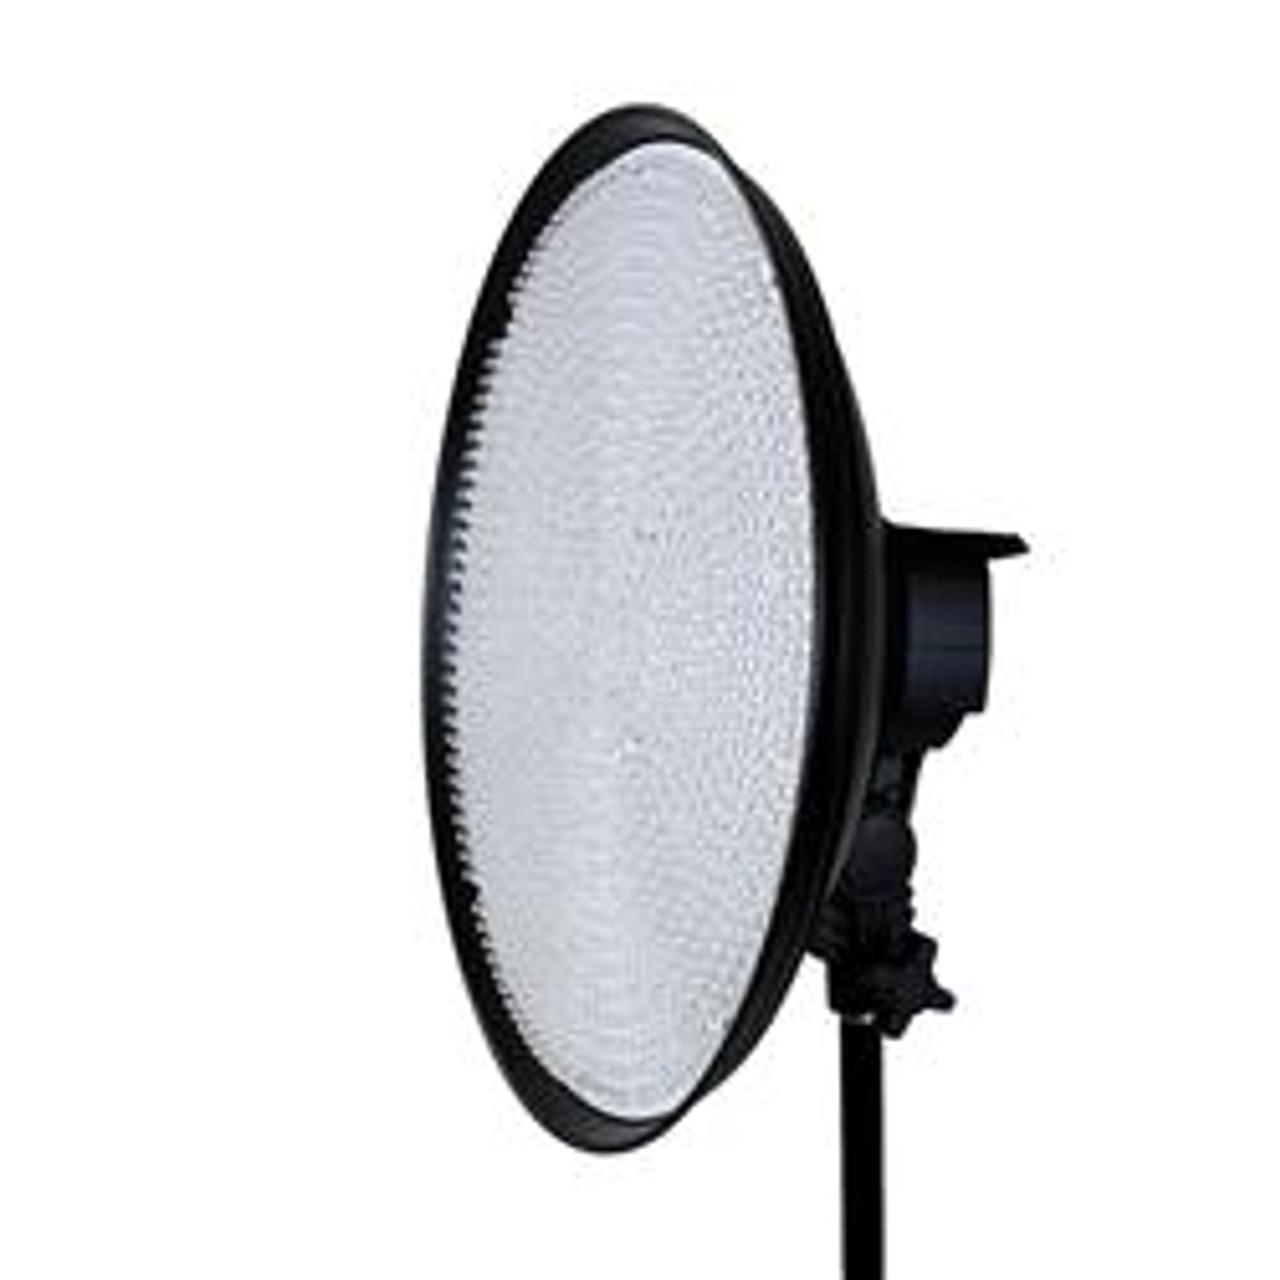 Promaster VL-1144 LED Studio Light